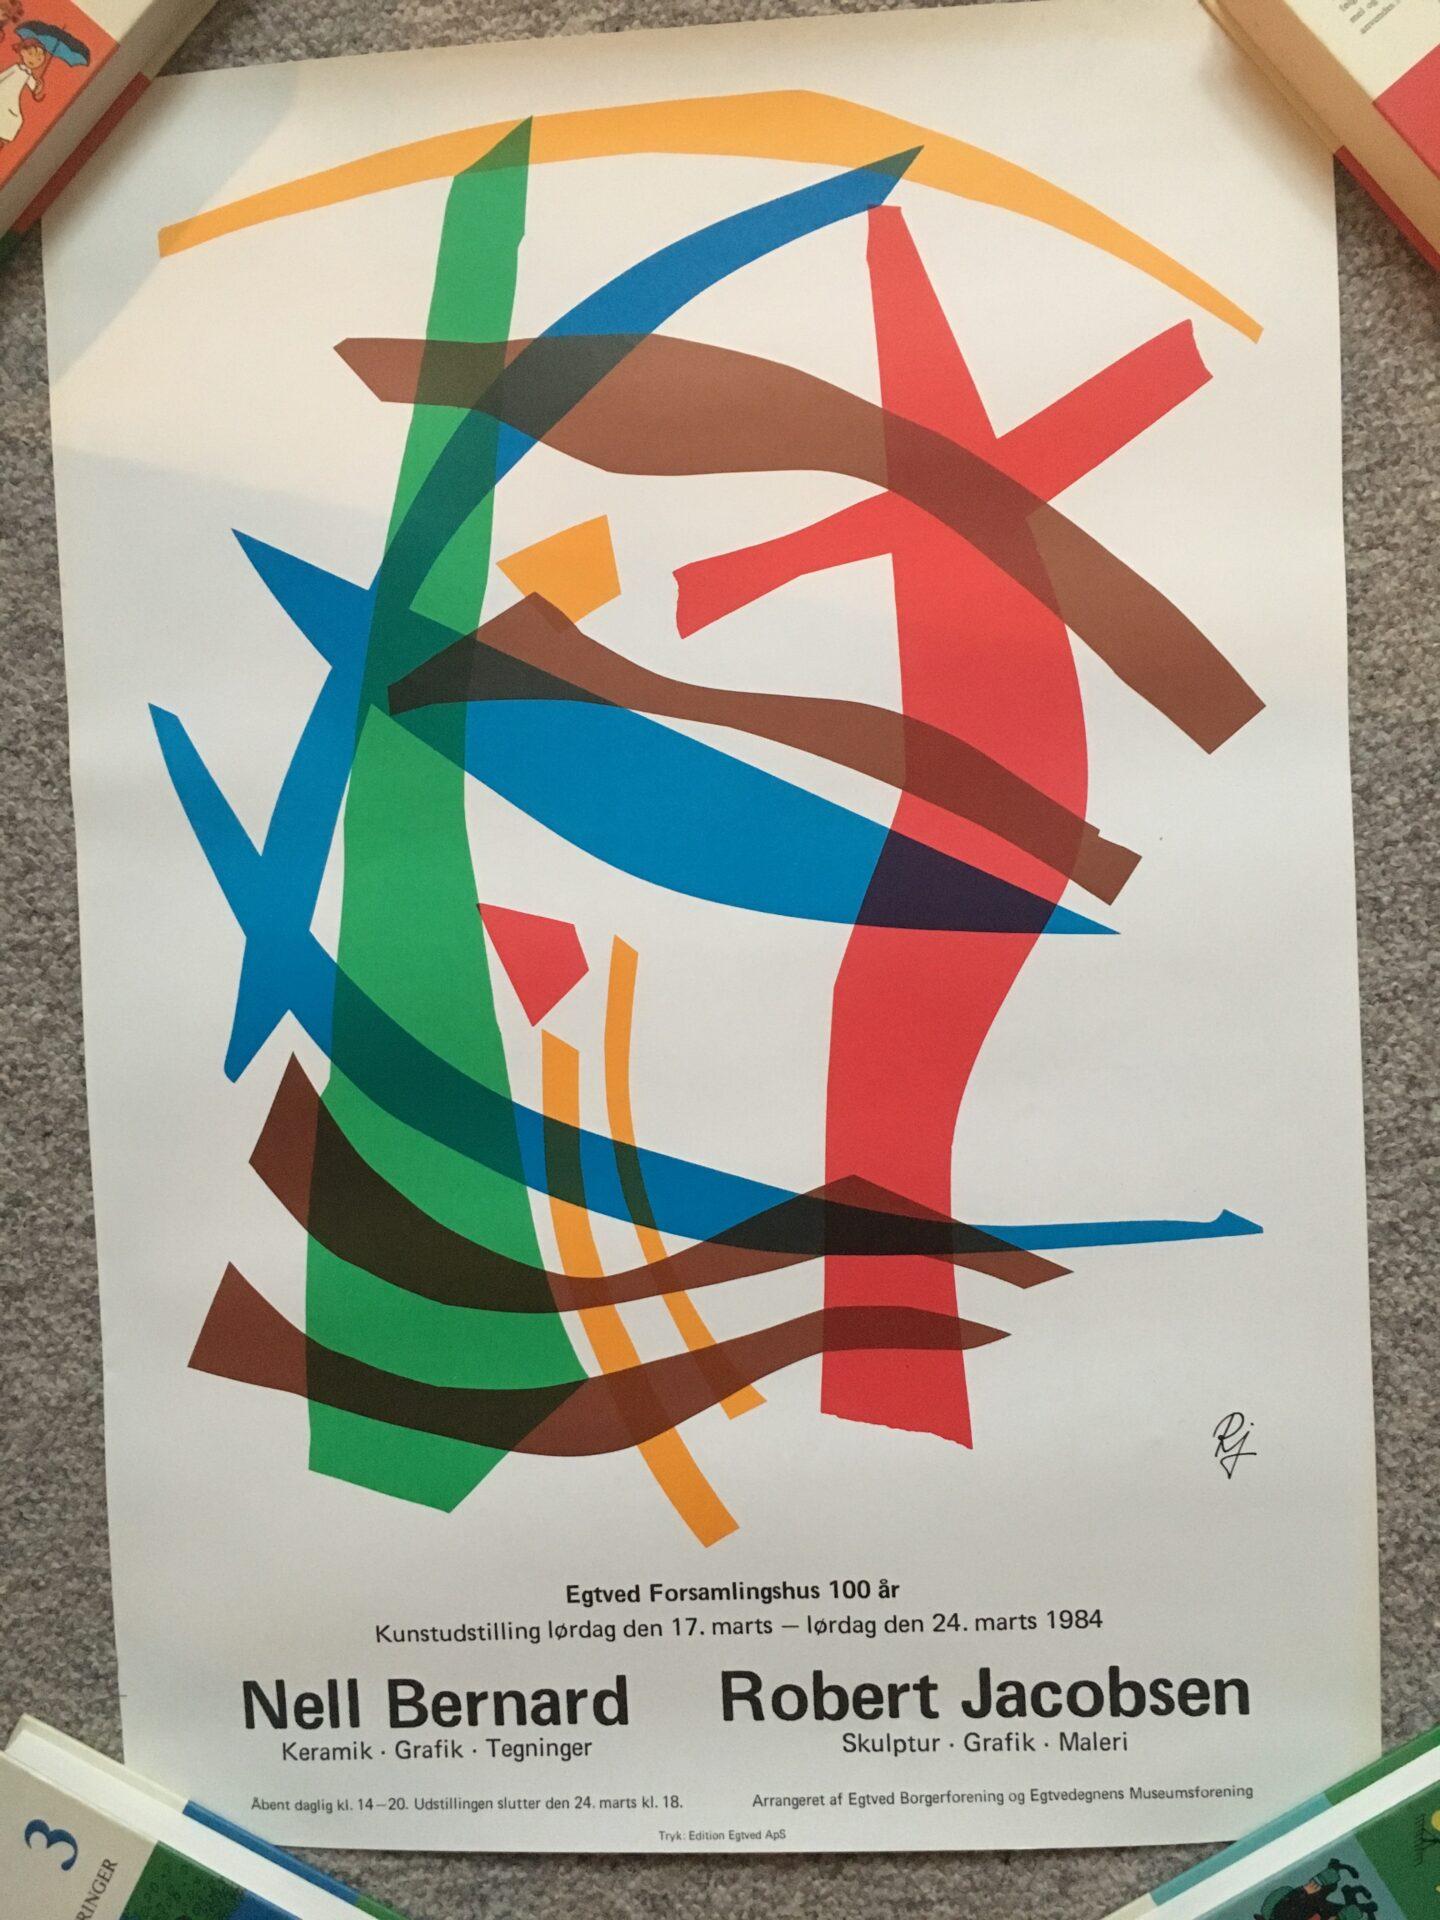 Robert Jacobsen udstillingsplakat, 43x60 cm, pris 100 kr